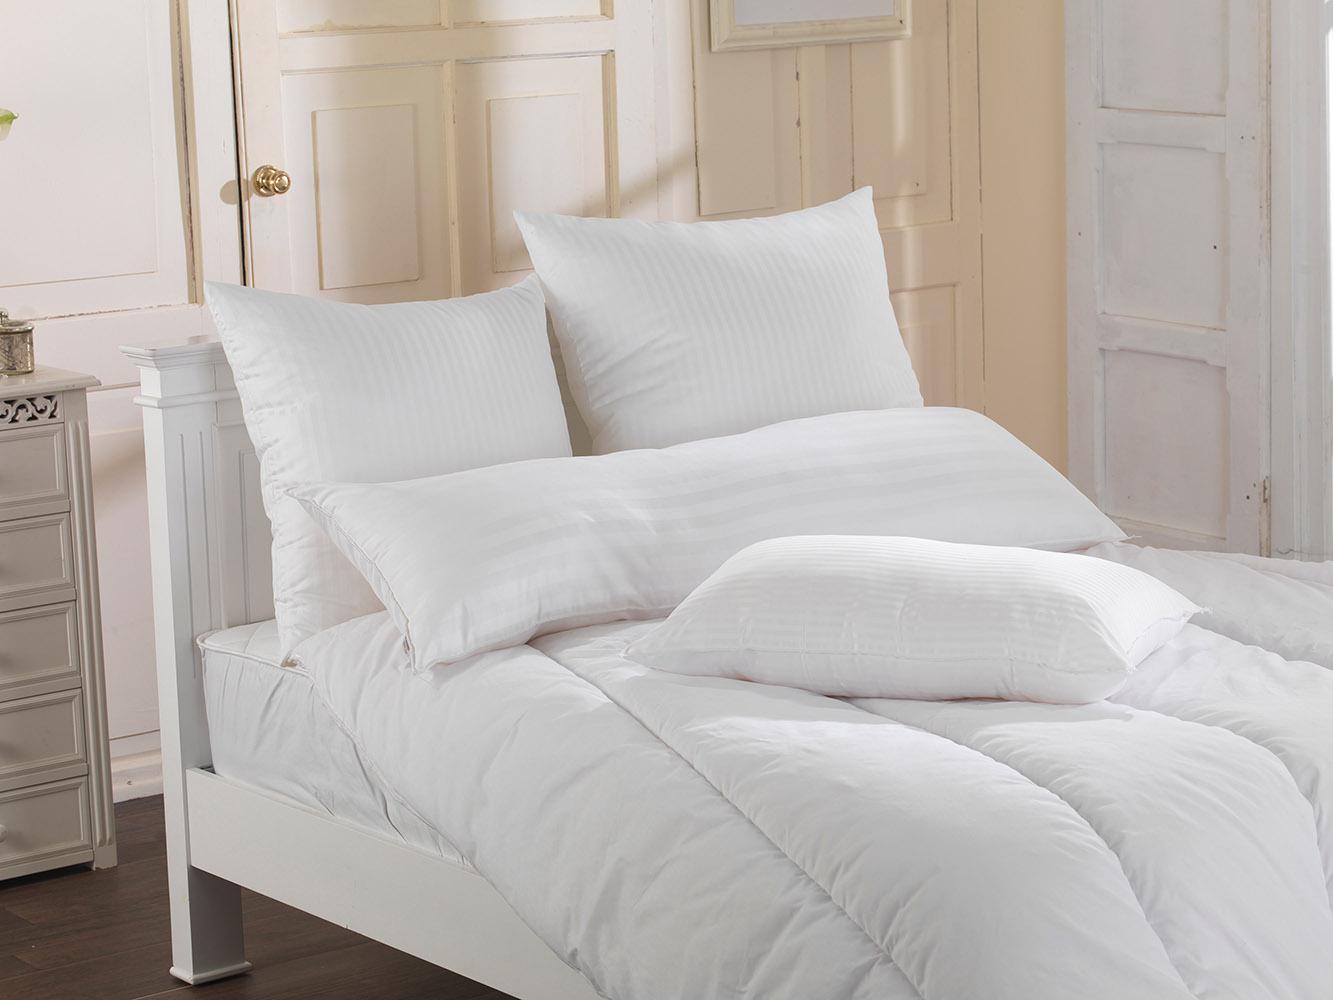 Luxury Euro Continental Square Egyptian Cotton Cover Satin Stripe Pillows; 65 x 65 cm, 80 x 80 cm